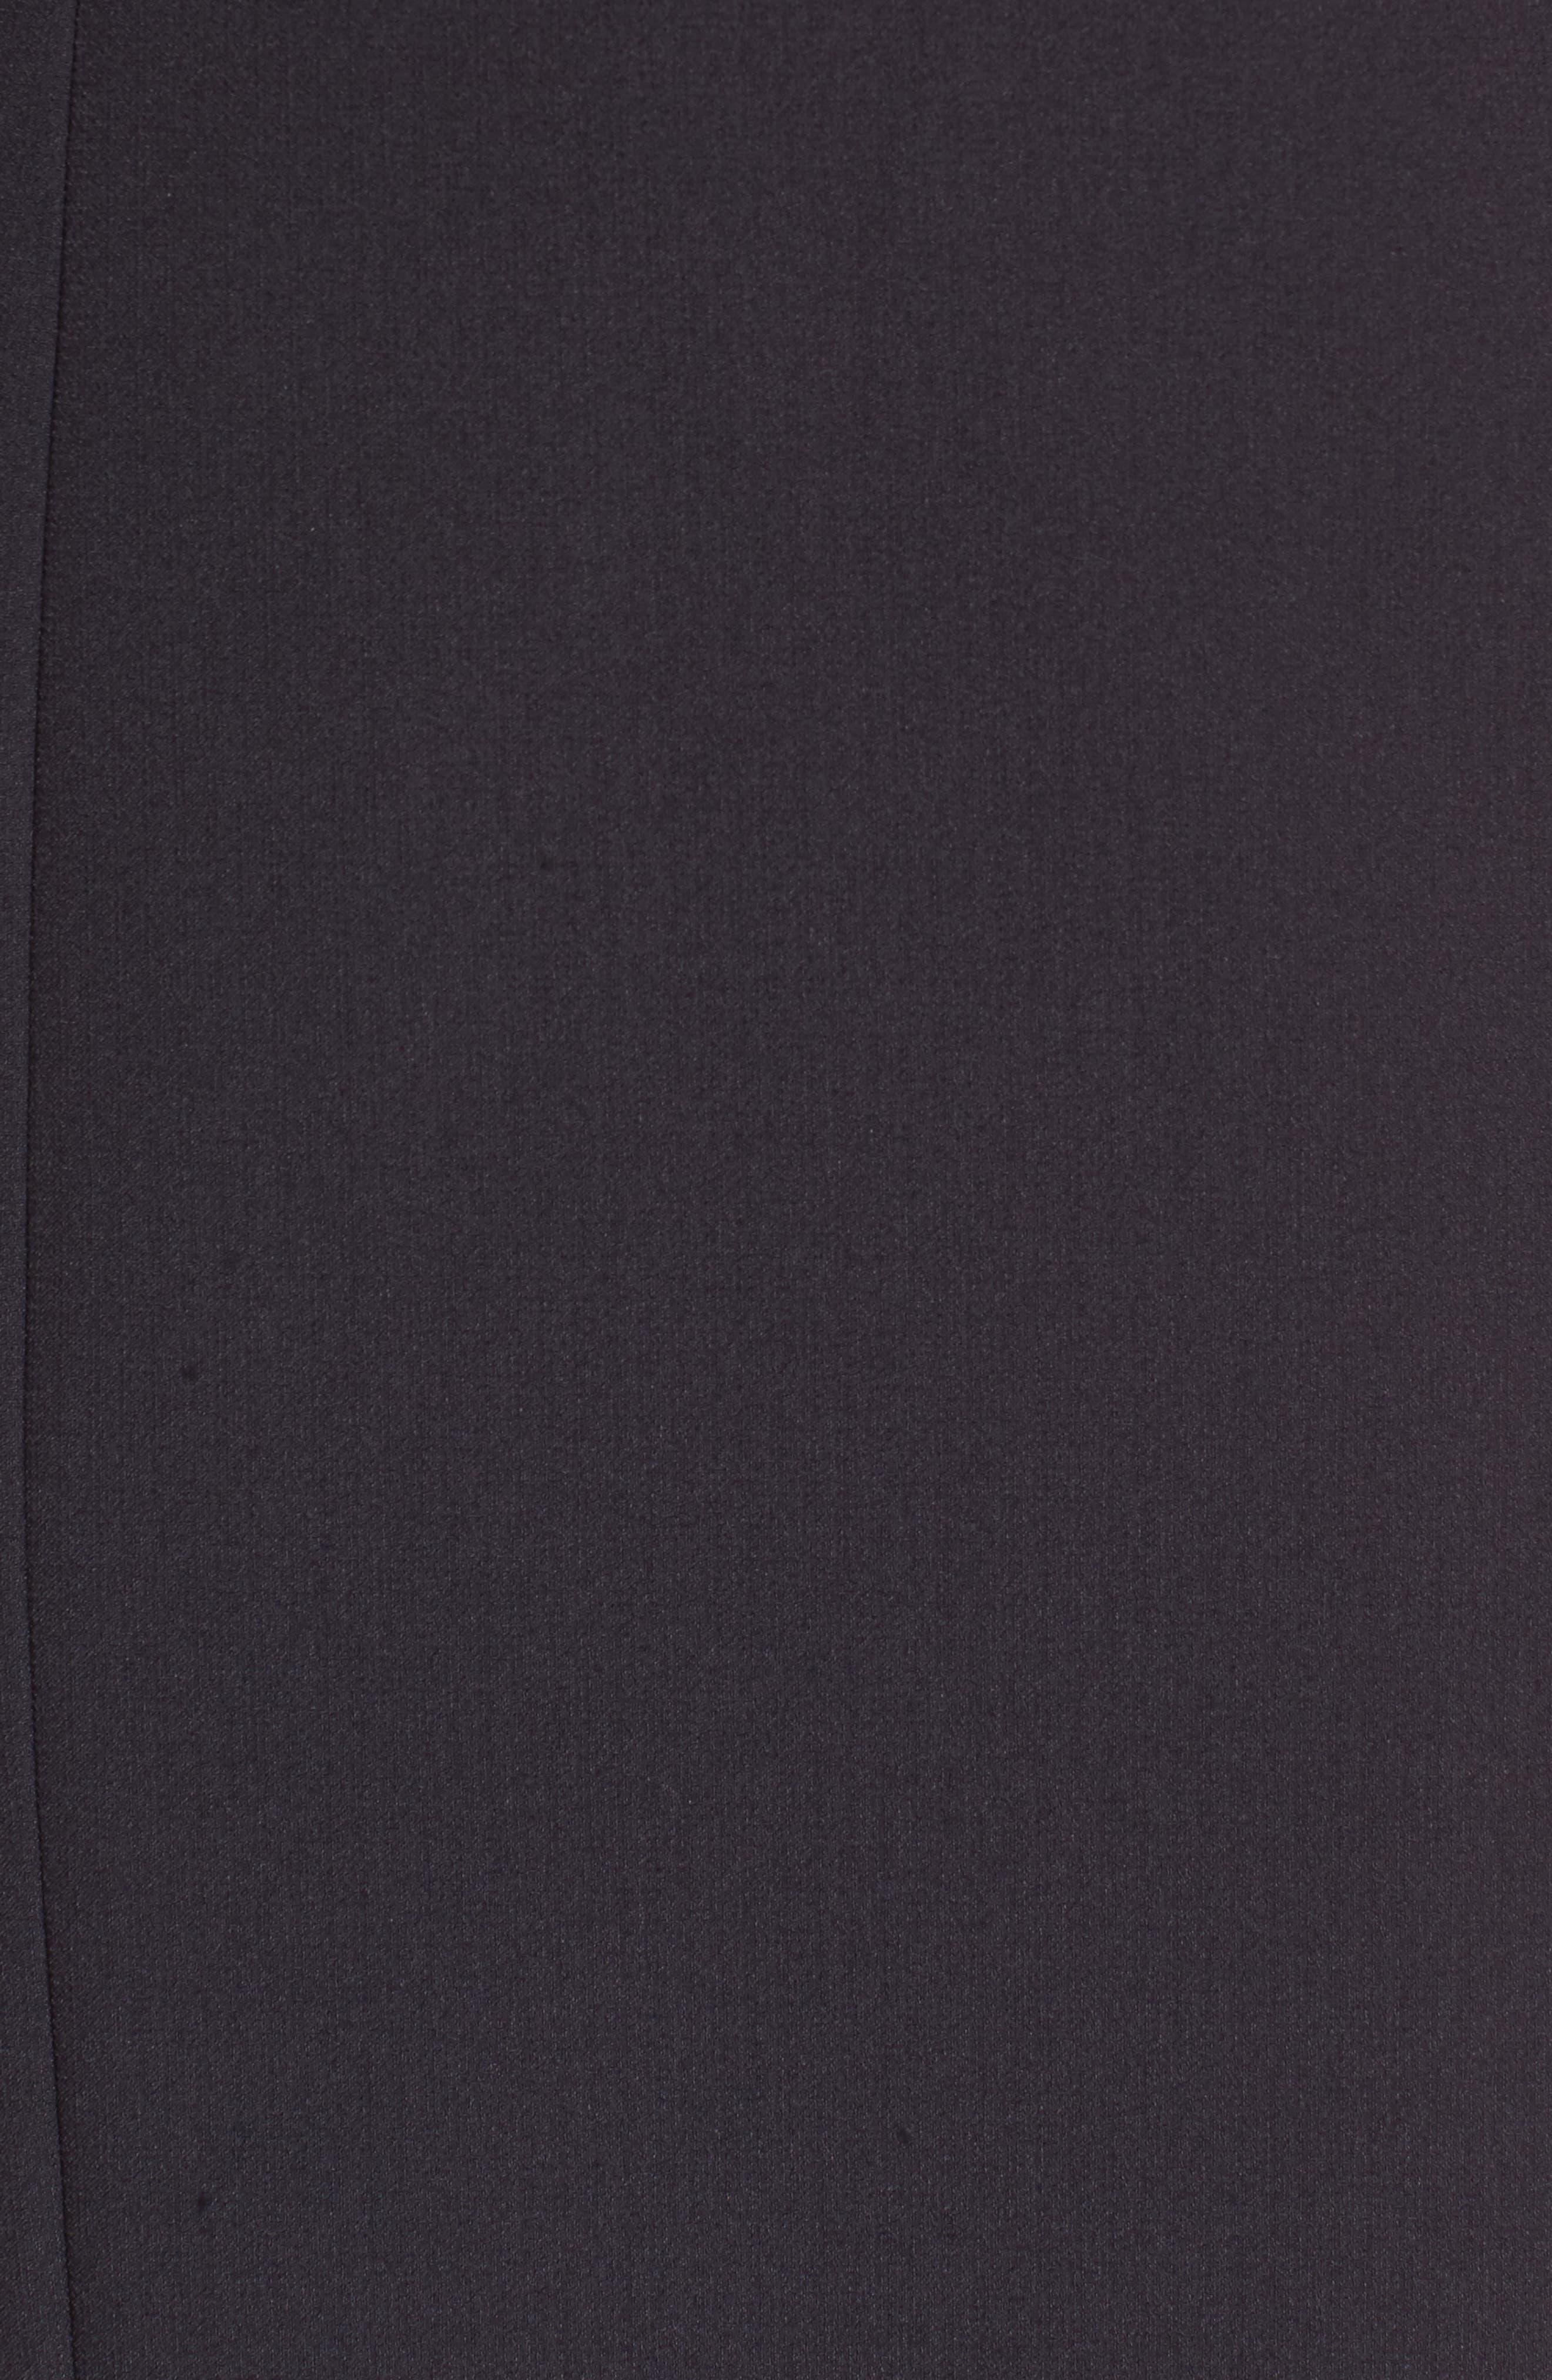 Bell Sleeve Sheath Dress,                             Alternate thumbnail 5, color,                             001